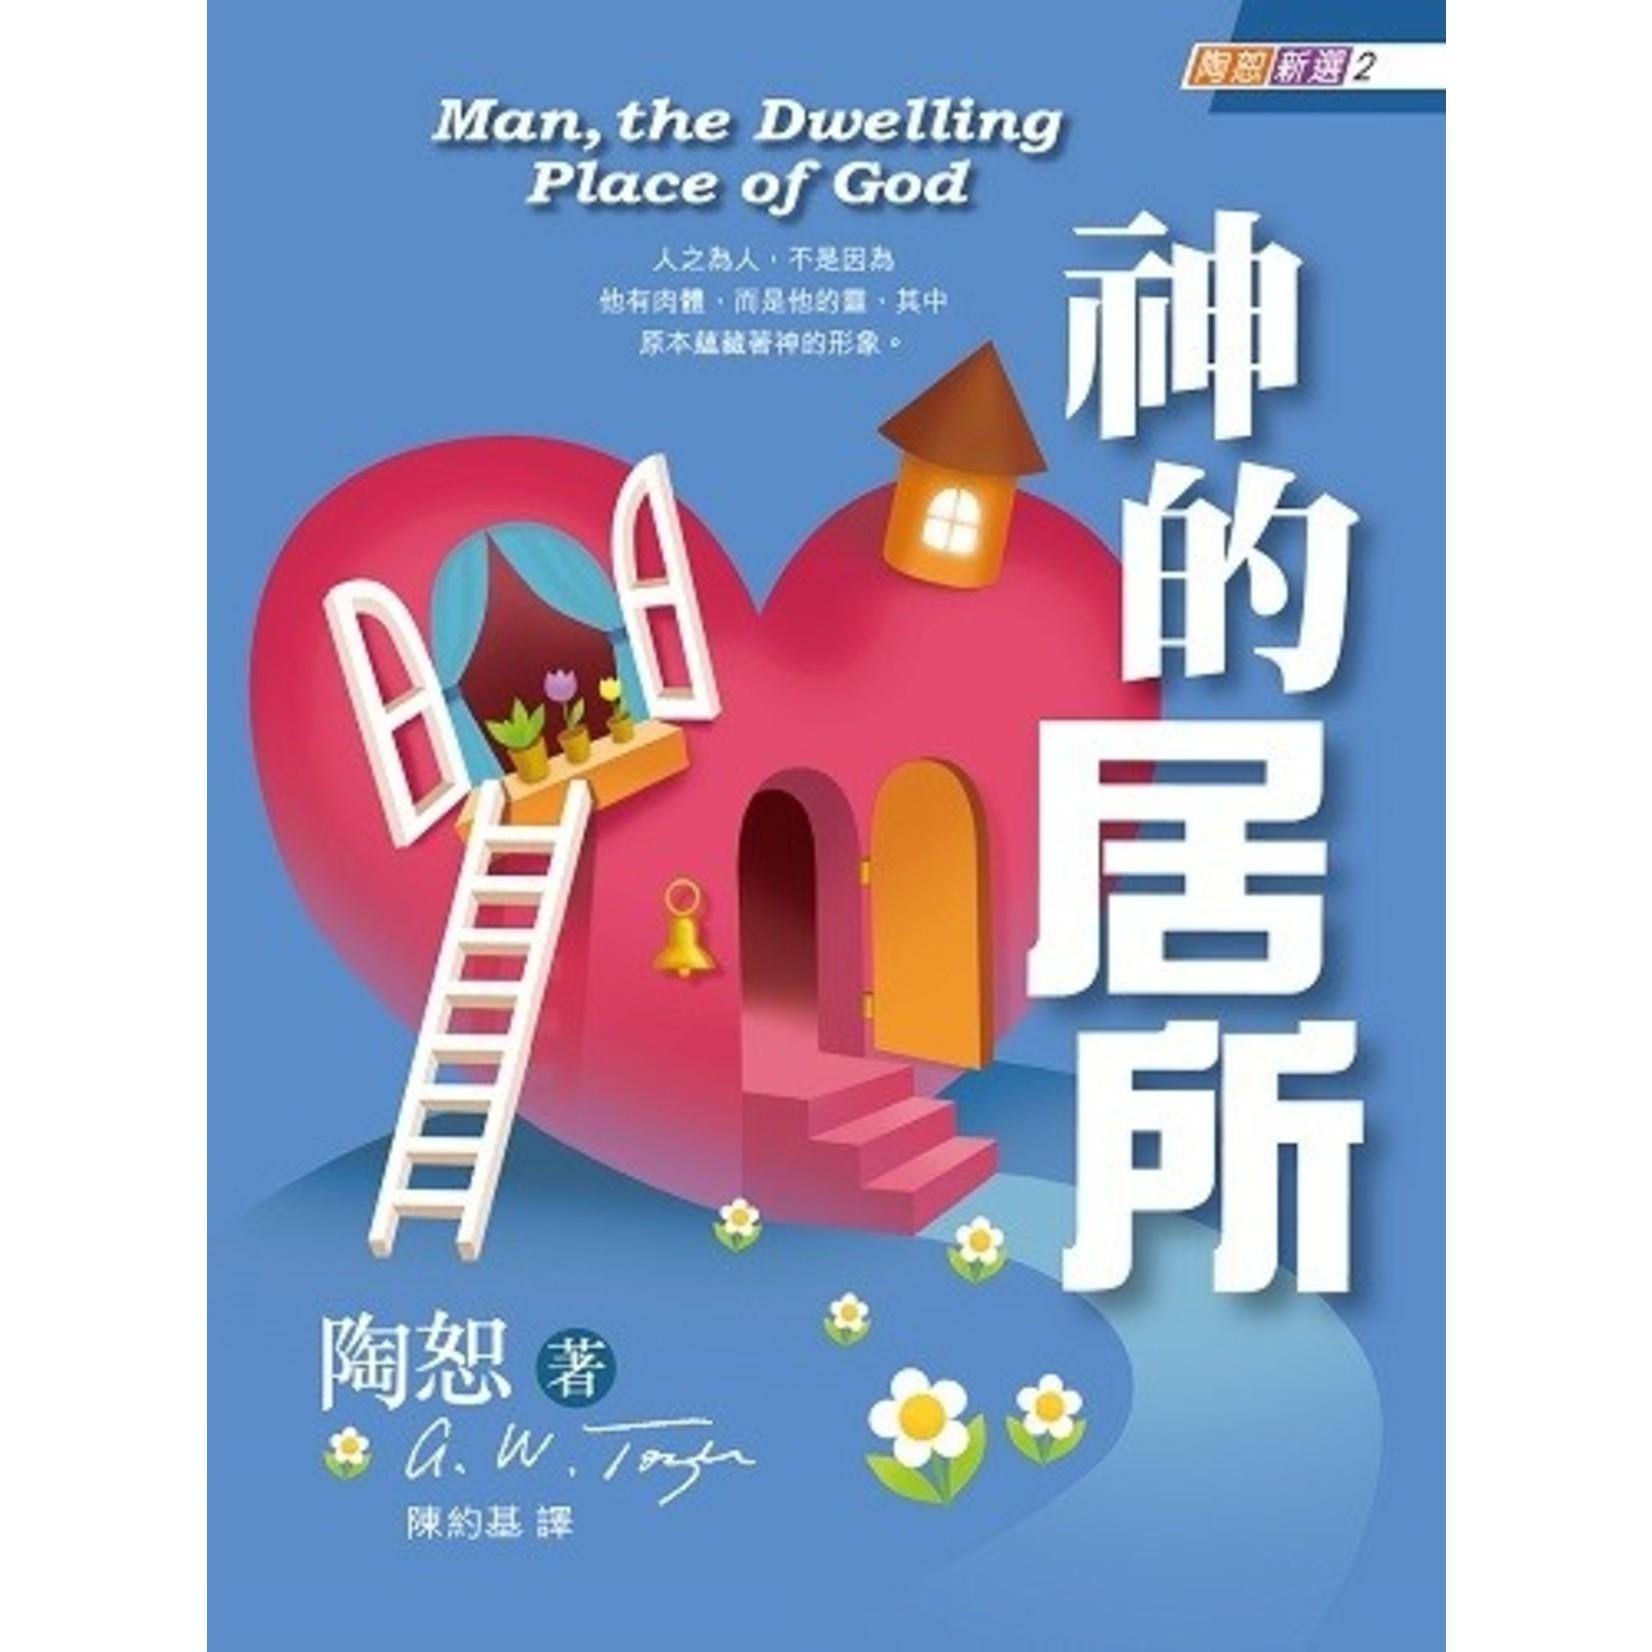 宣道 China Alliance Press 陶恕新選2:神的居所 Man, the Dwelling Place of God